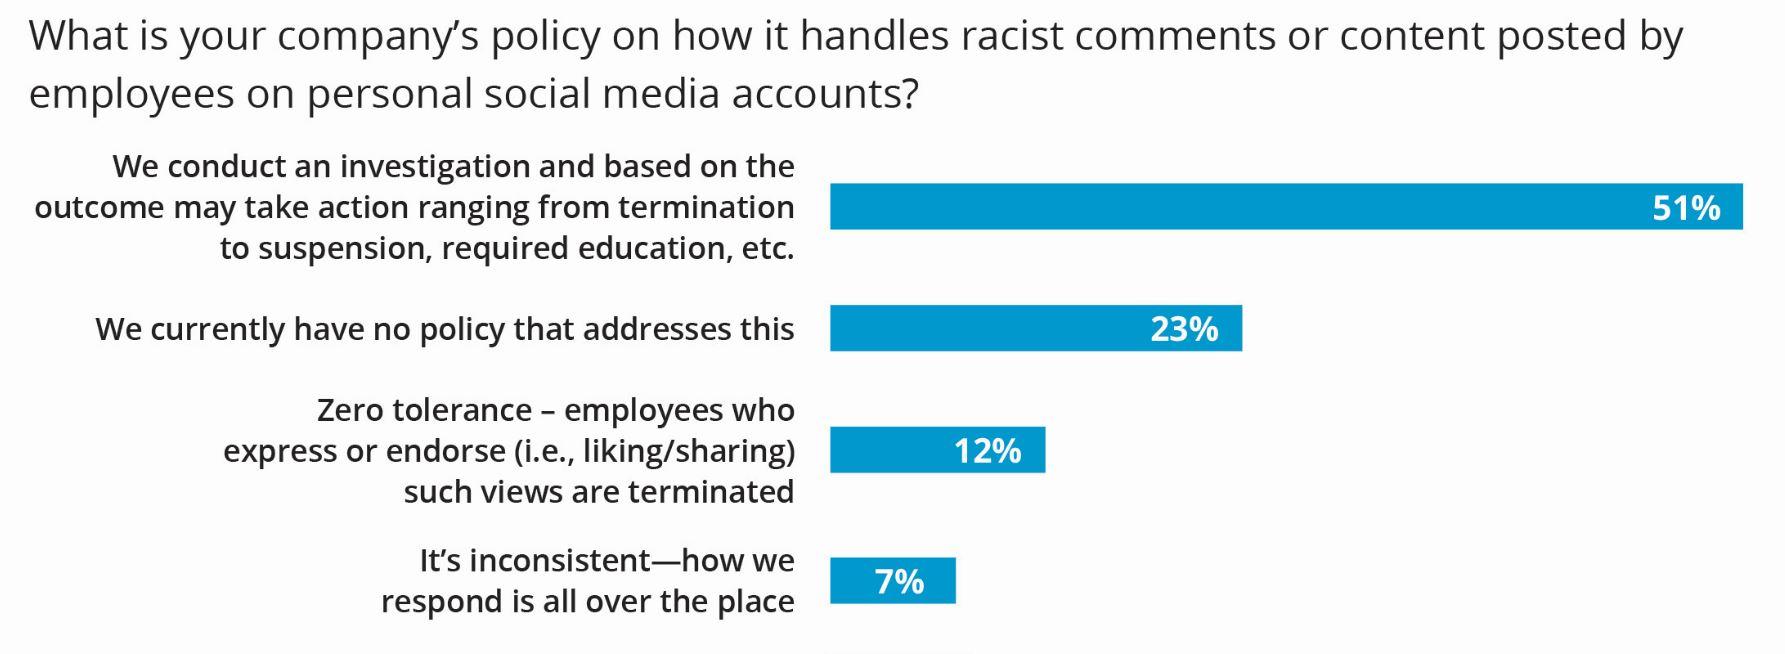 Racist Social Media Posts